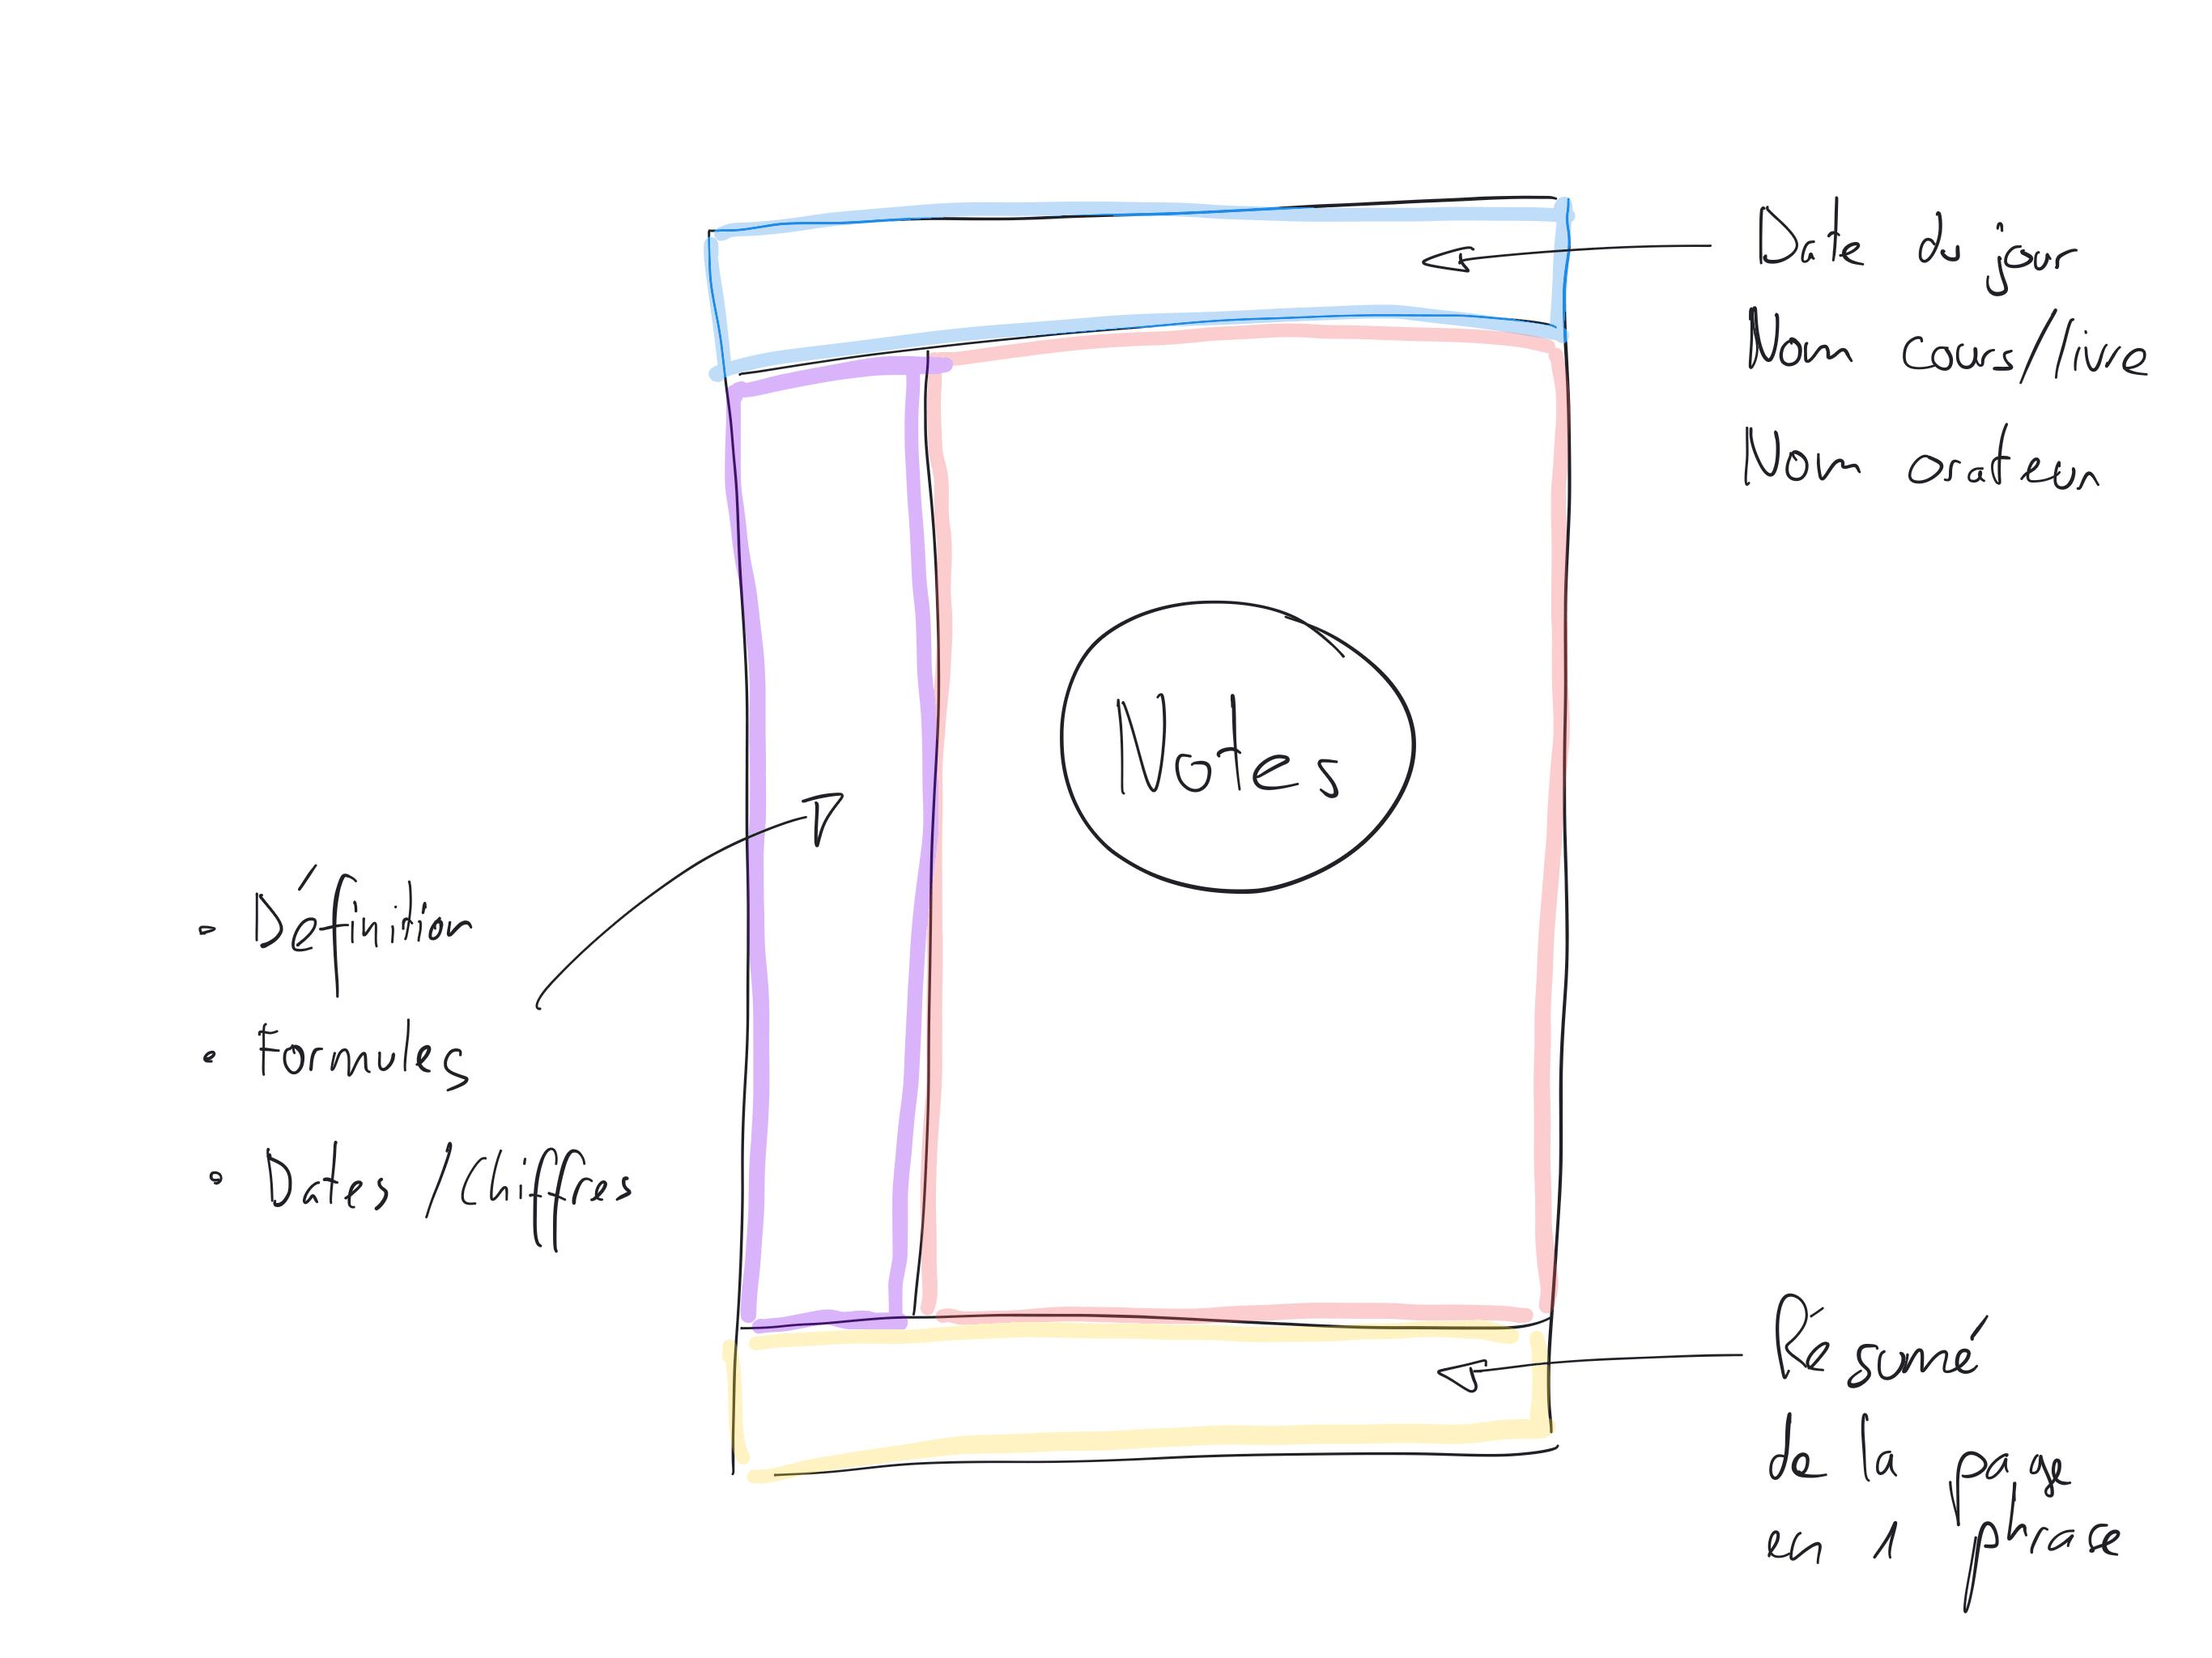 Structure méthode cornell